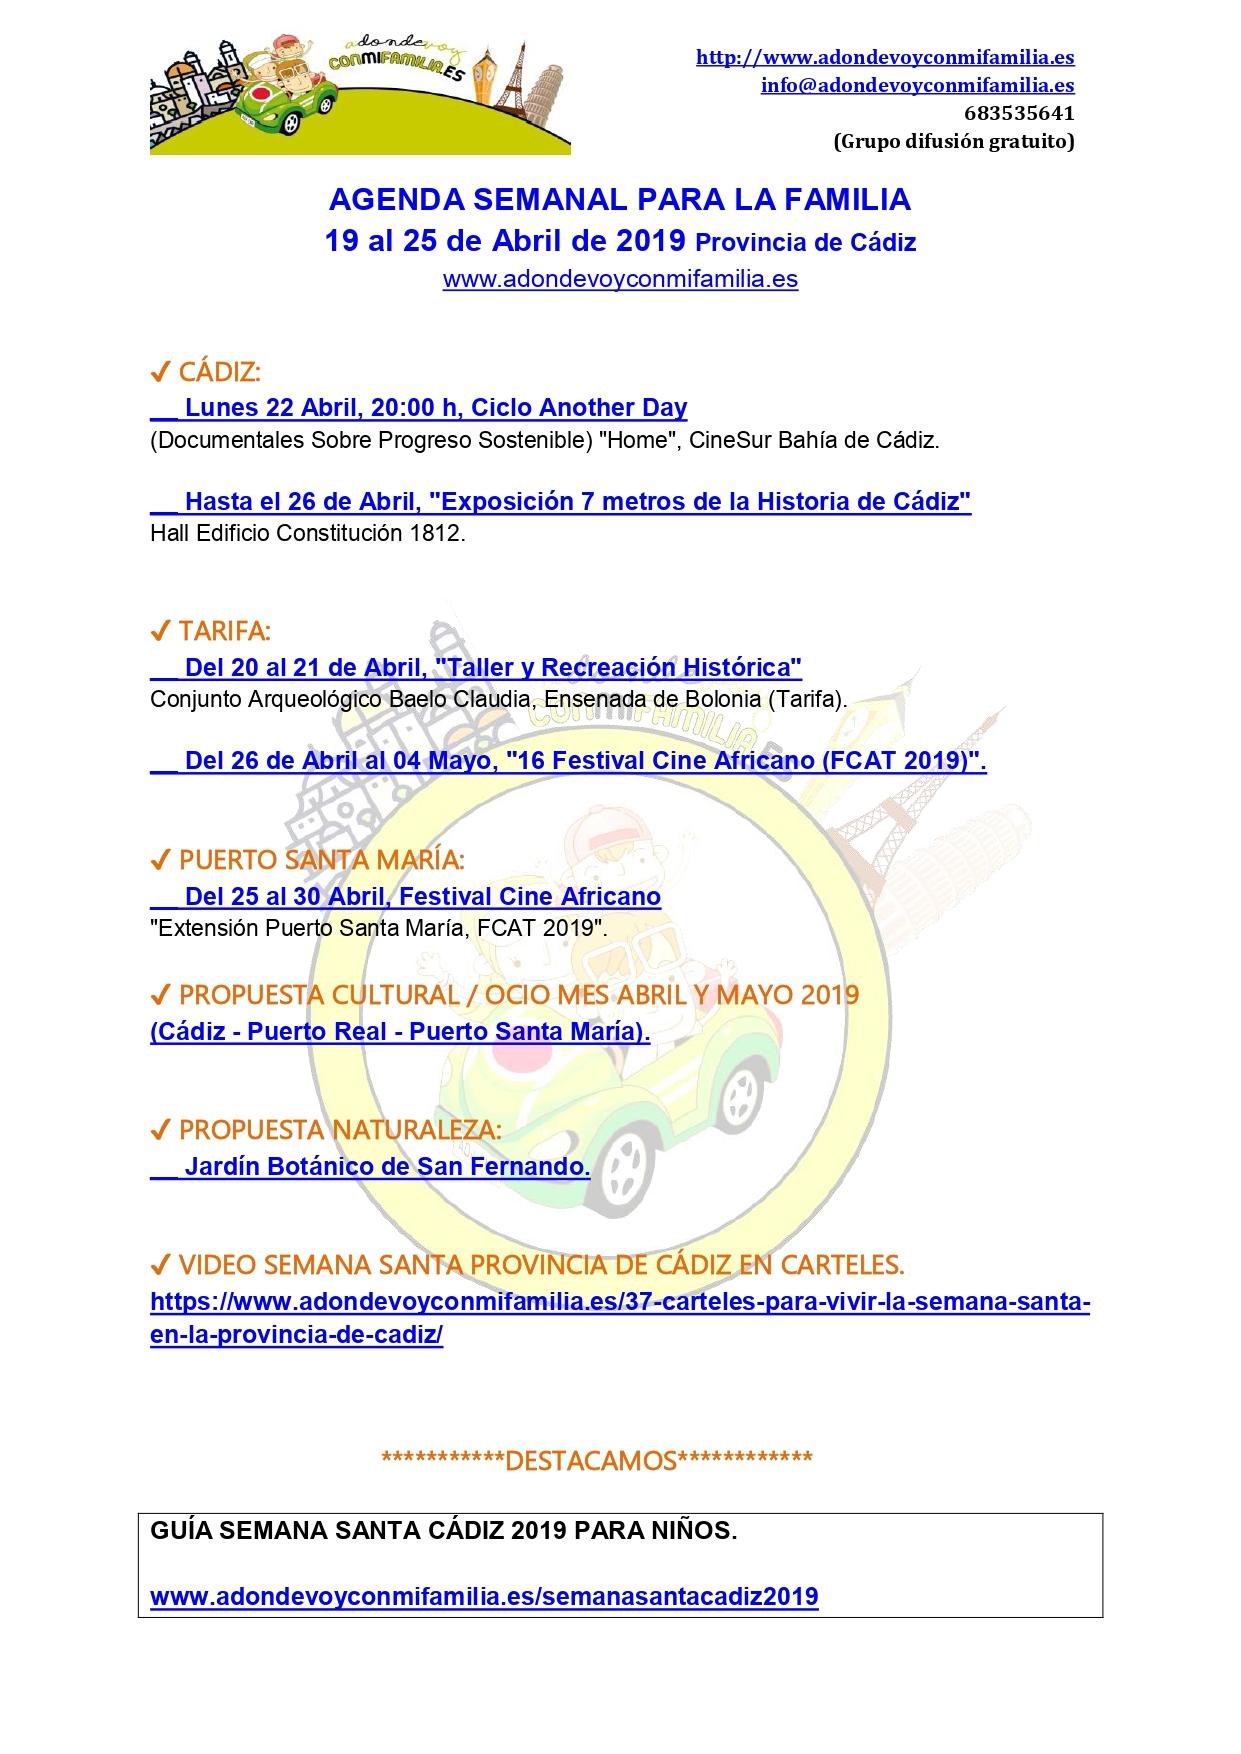 Agenda semanal familiar 19 al 25 abril 2019